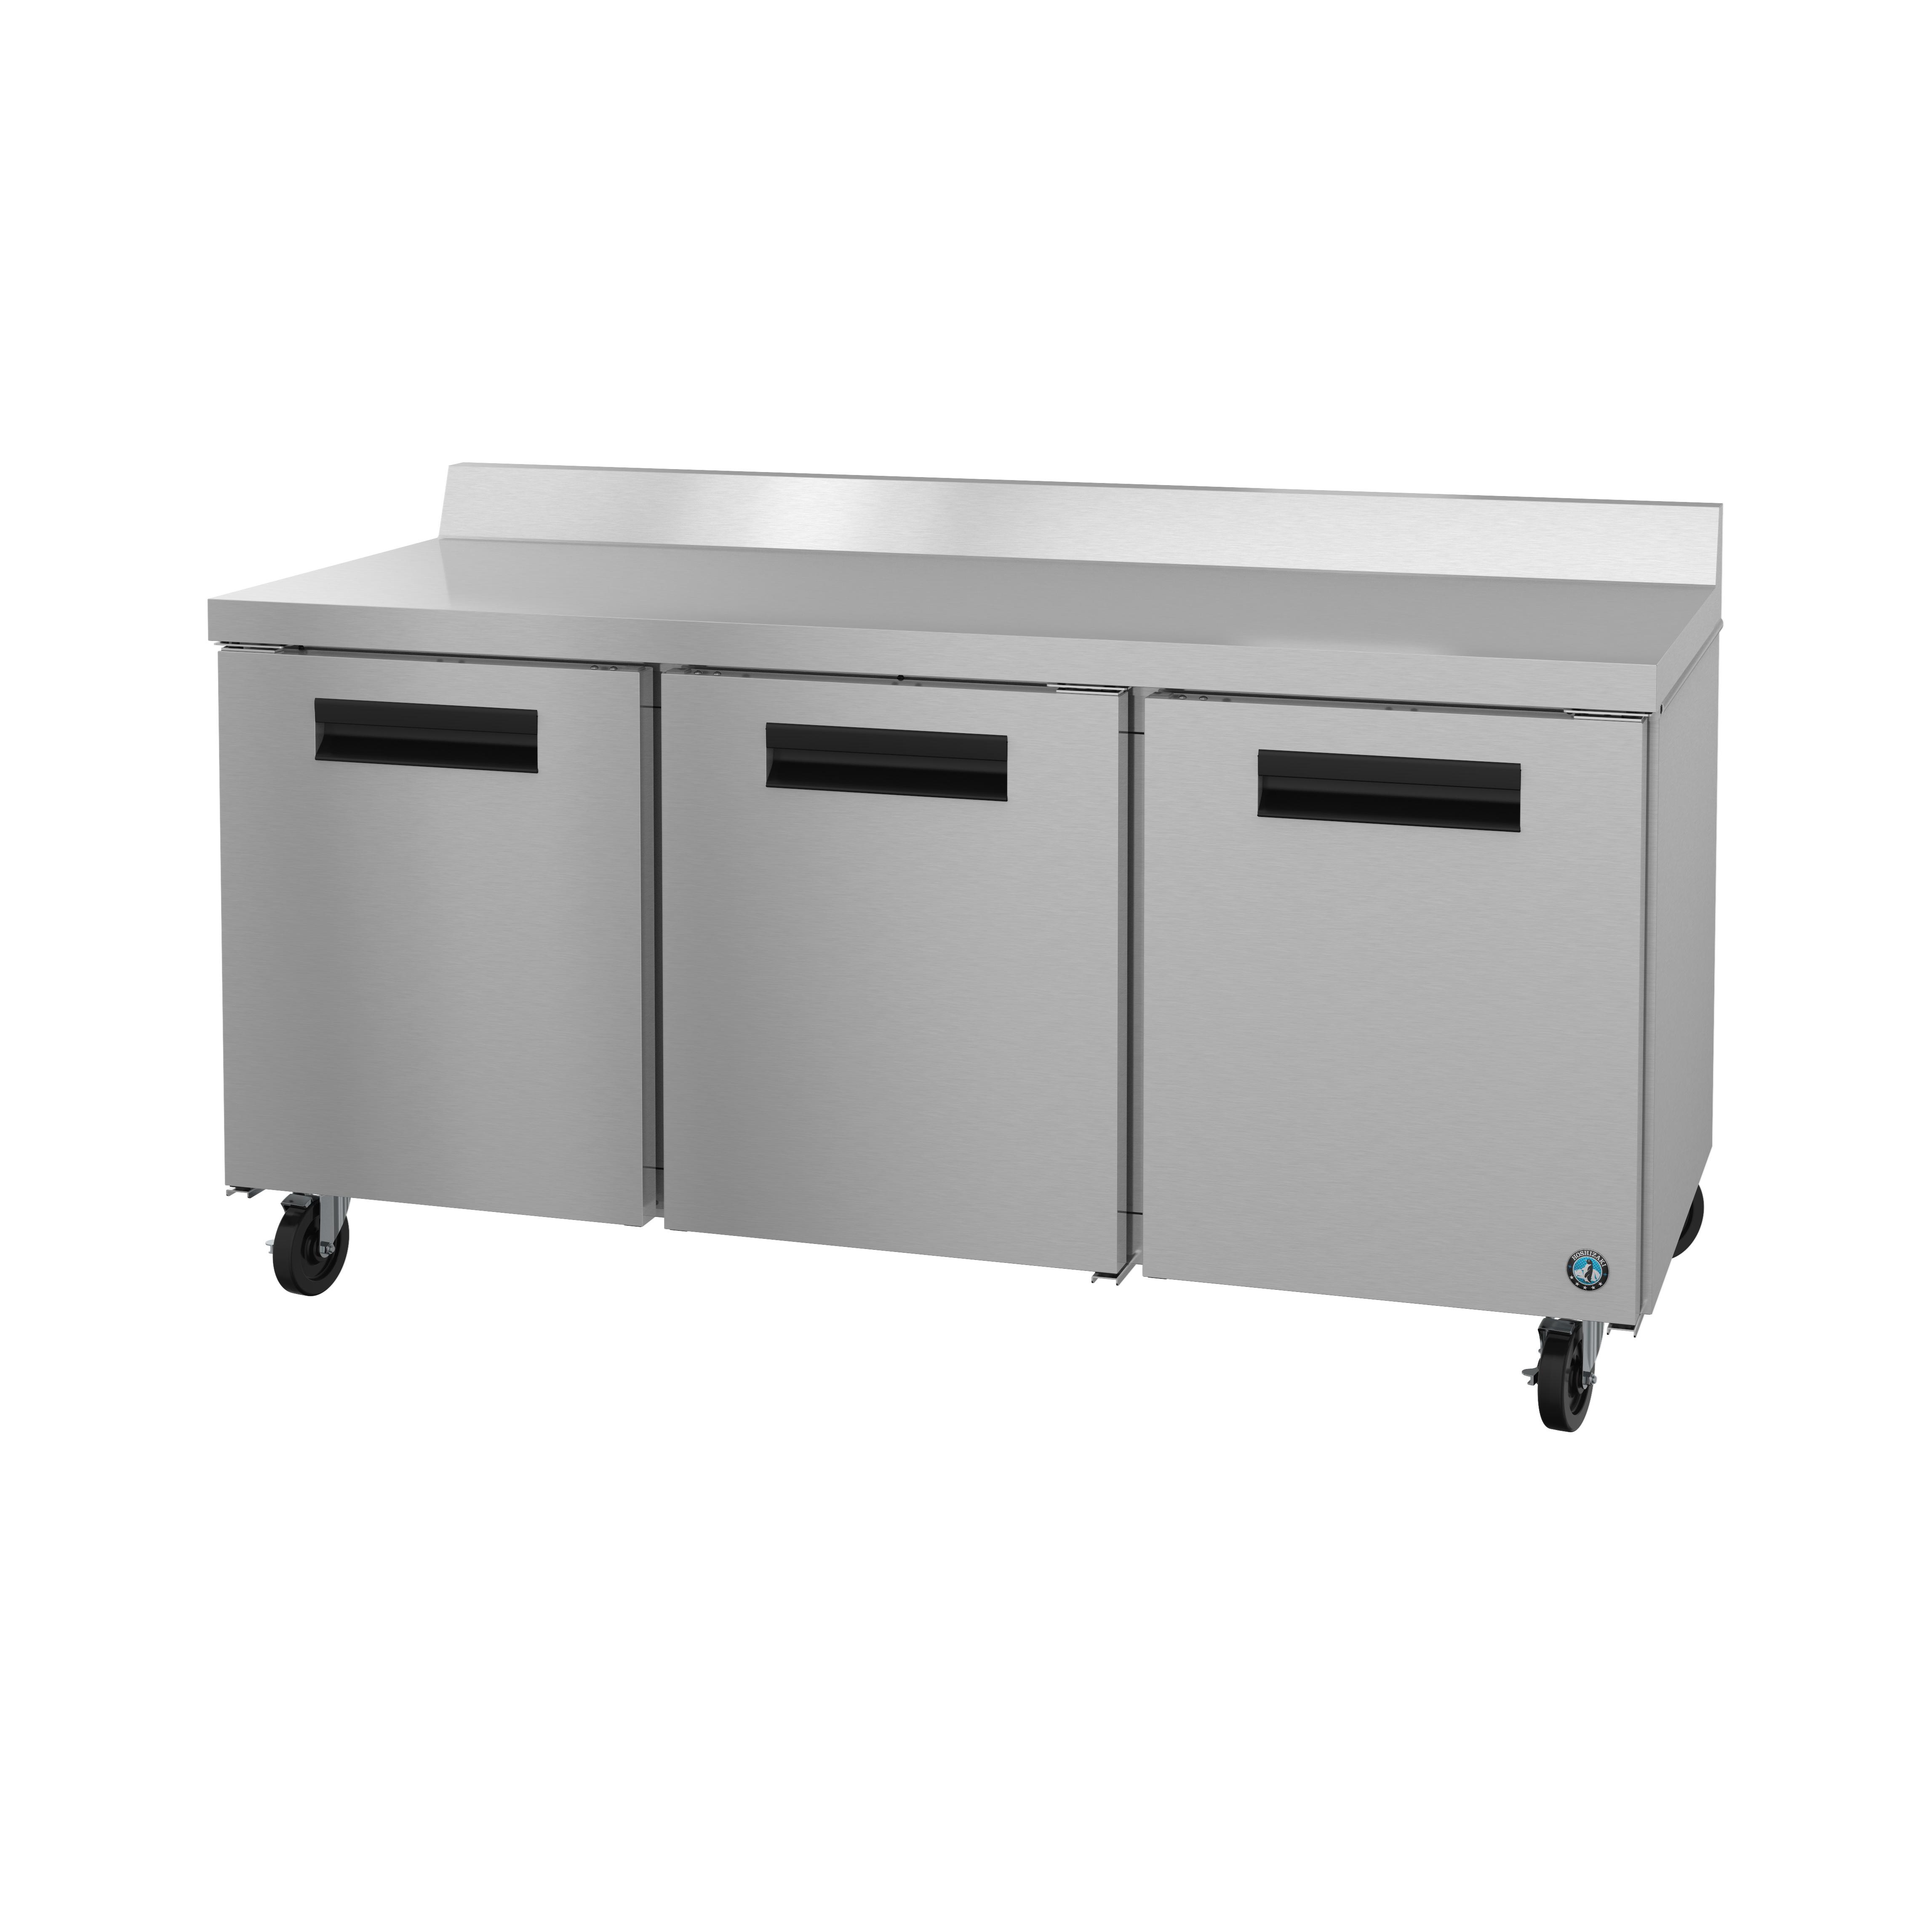 Hoshizaki WR72A refrigerated counter, work top